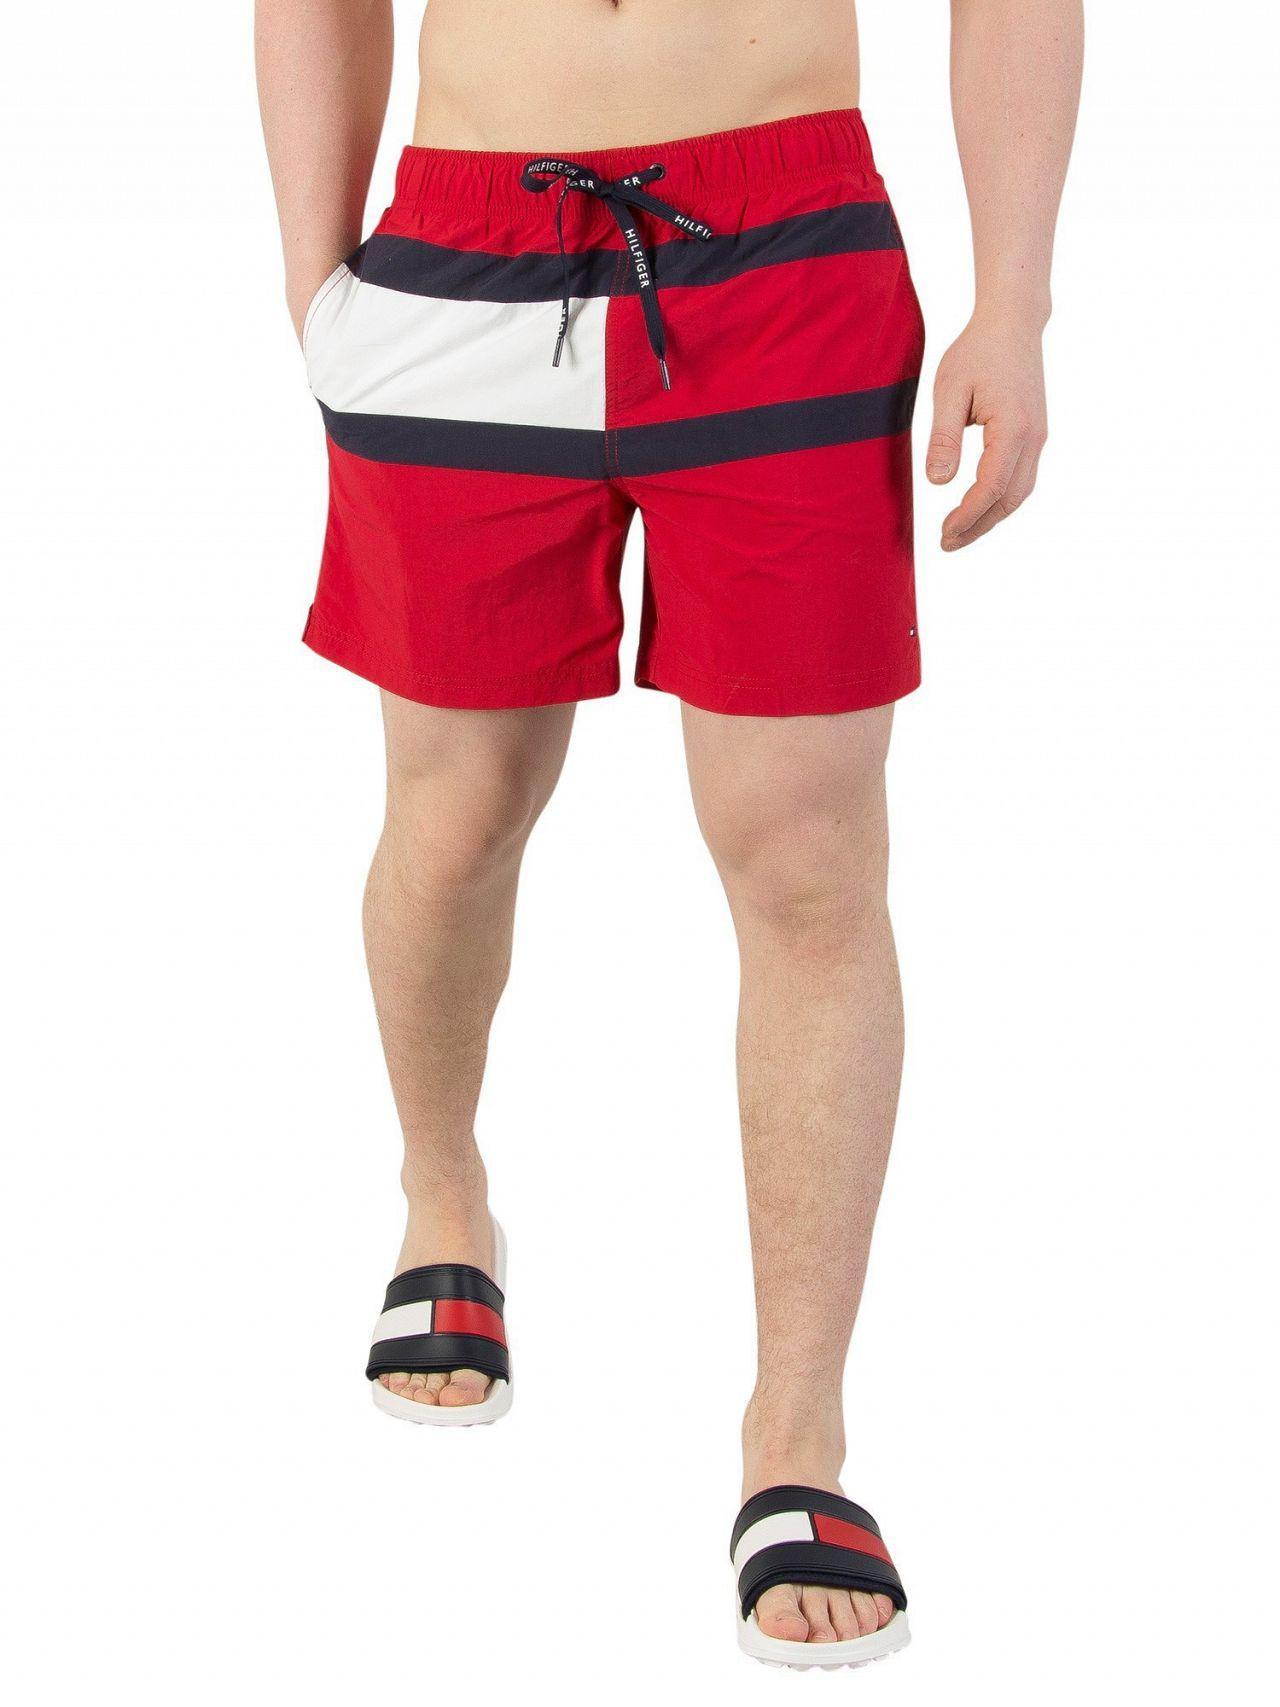 ded6a44a18 Tommy Hilfiger Men's Medium Drawstring Swim Shorts, Red Men's Shorts ...